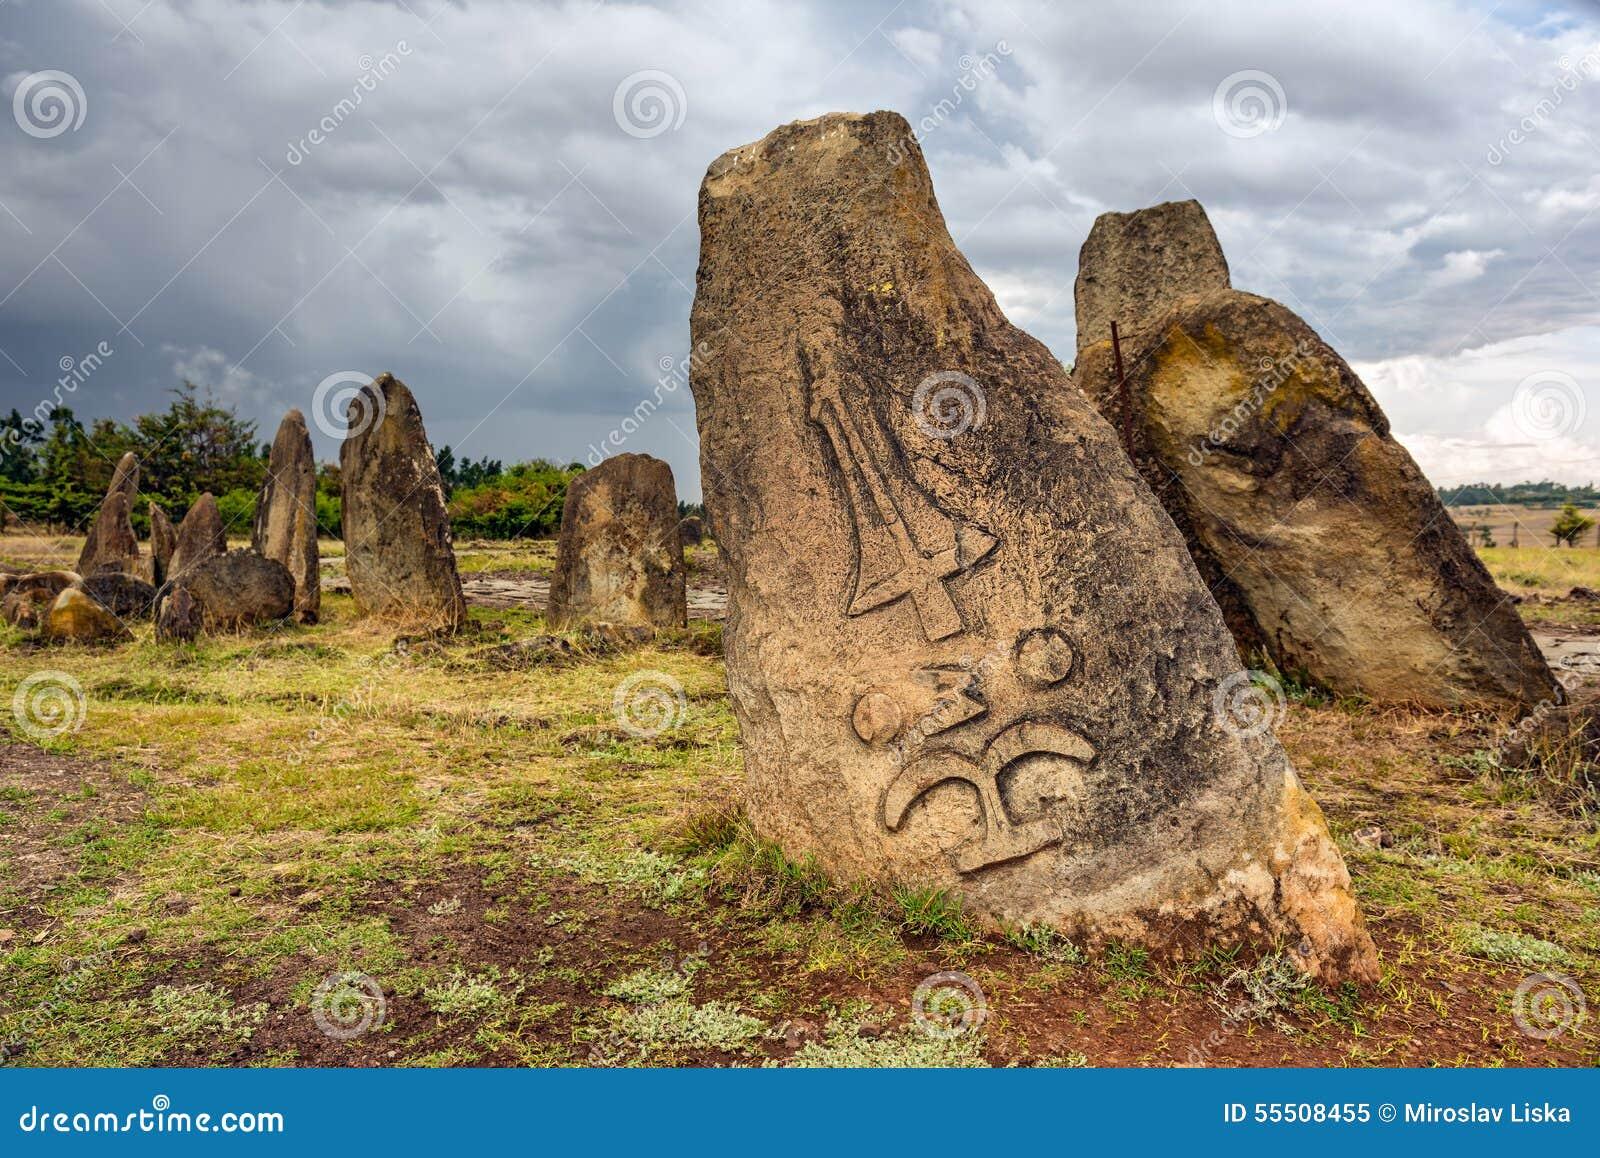 Megalithen-Tiya-Steinsäulen, Addis Ababa, Äthiopien